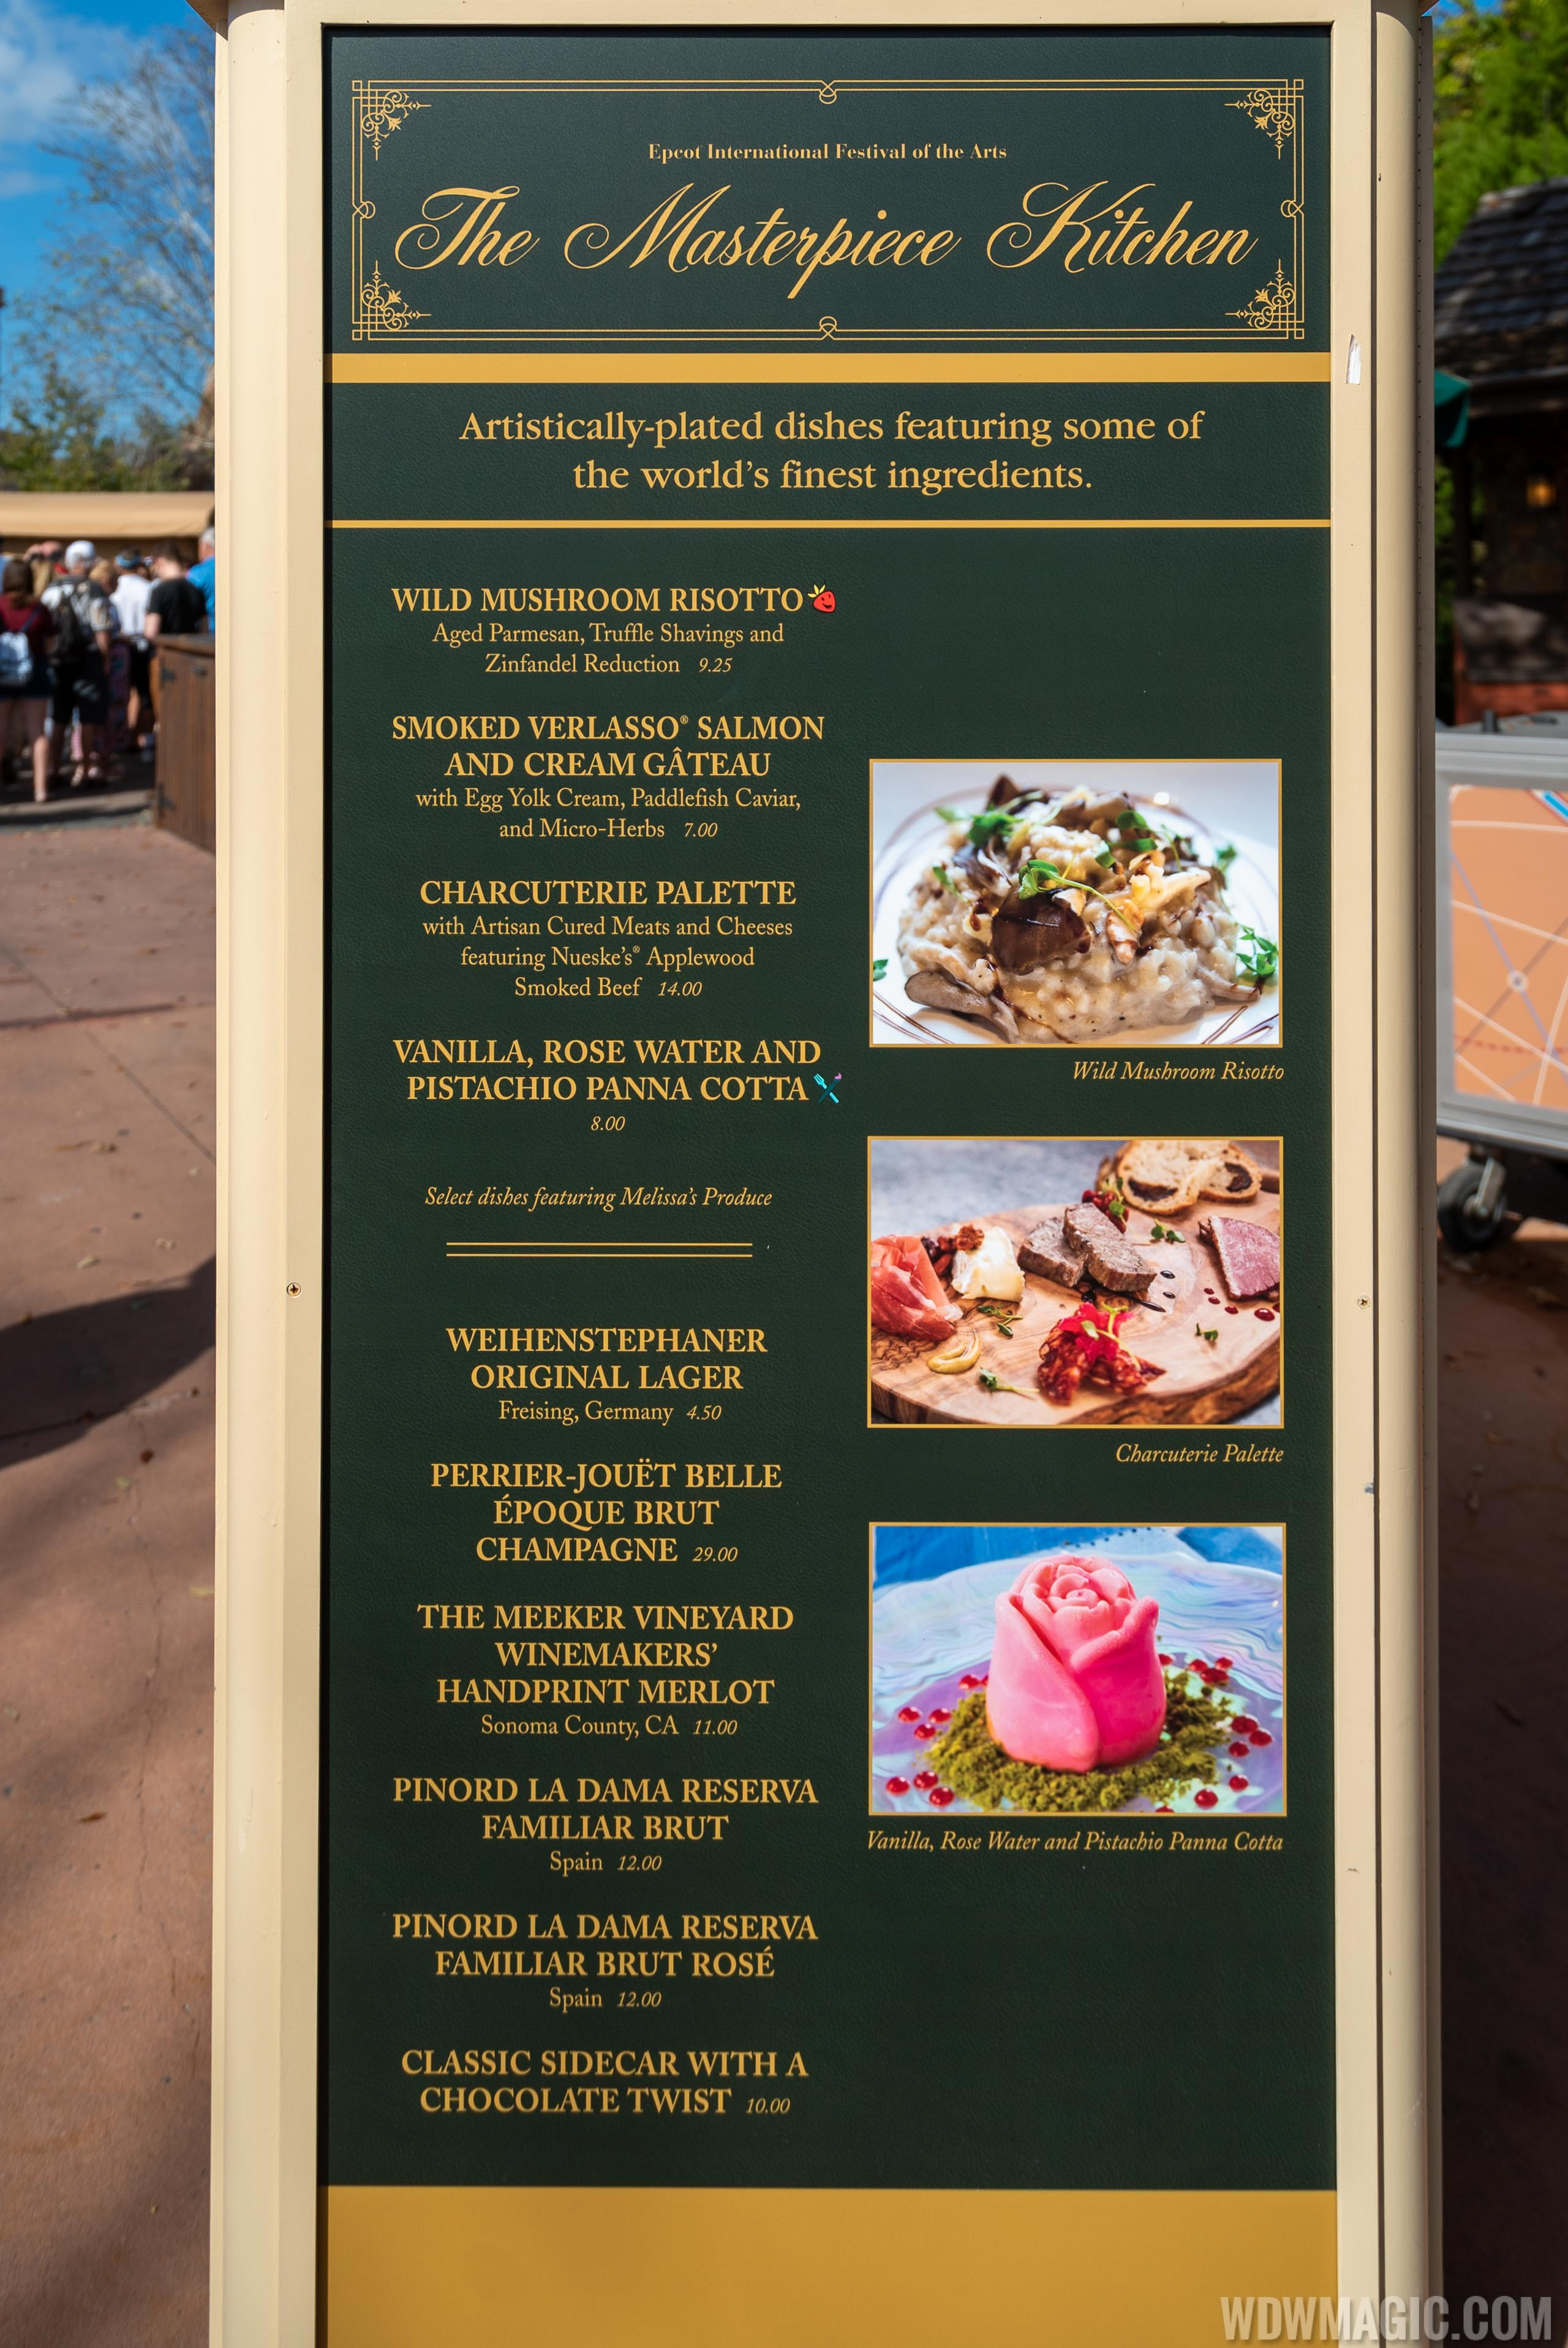 2020 Epcot Festival of the Arts Food Studio kiosks and menus